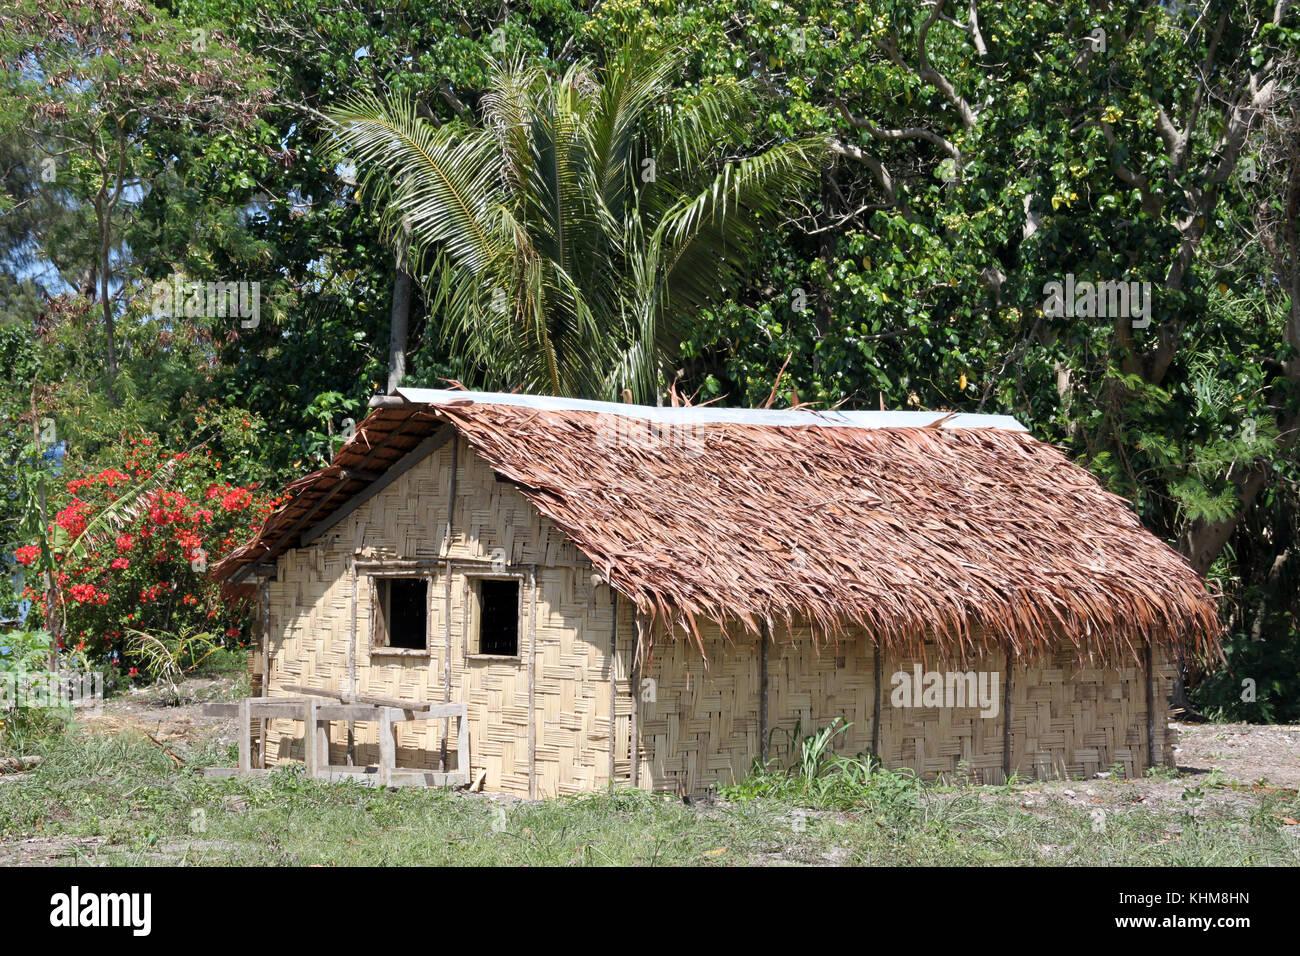 Hut and trees in Efate island, Vanuatu - Stock Image